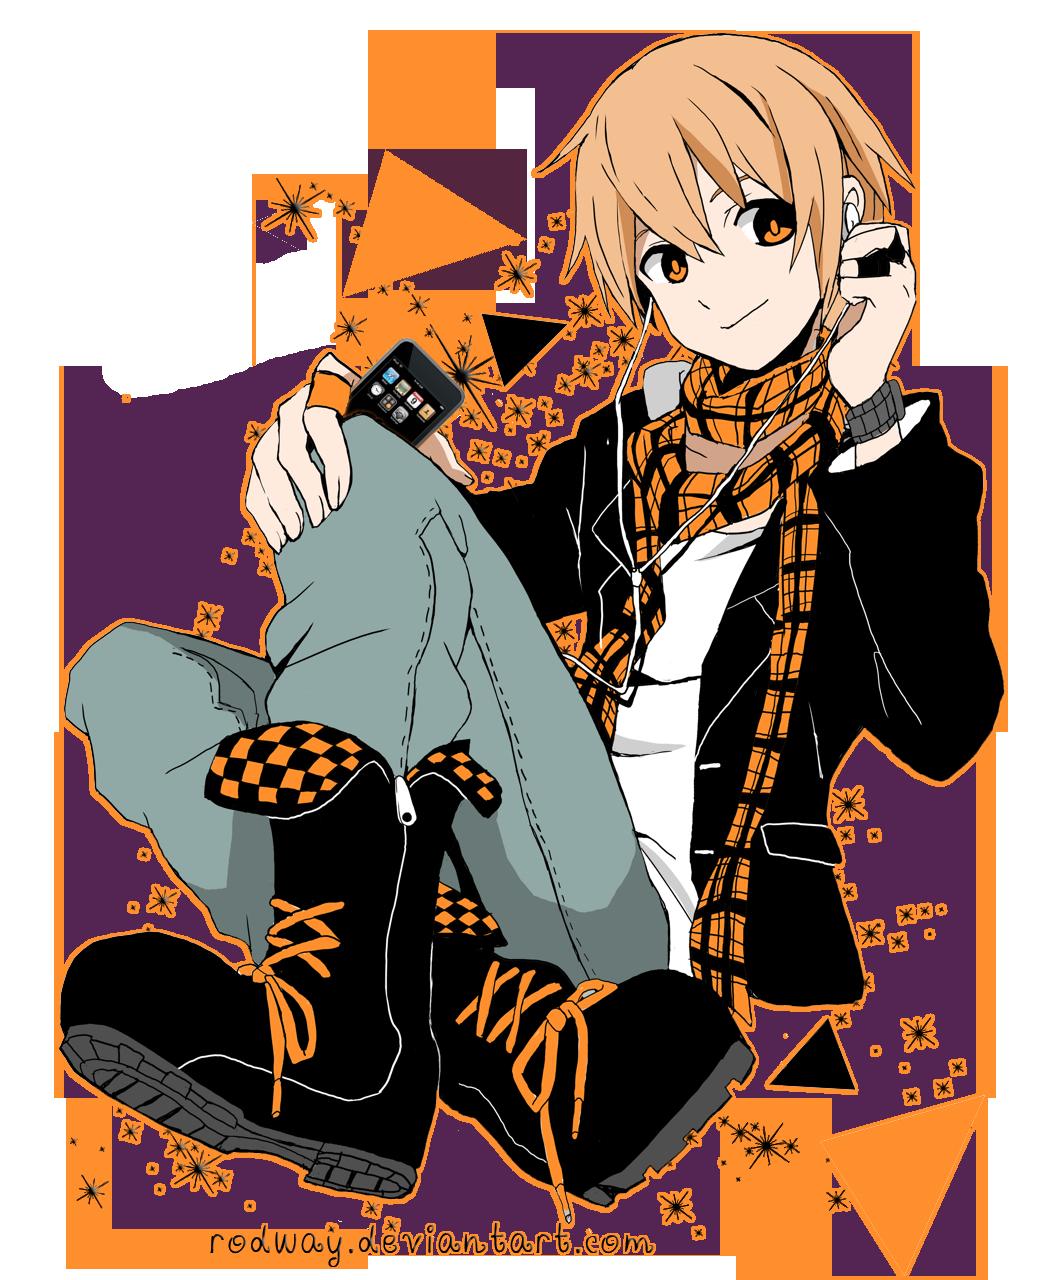 Orange Anime By Rodway